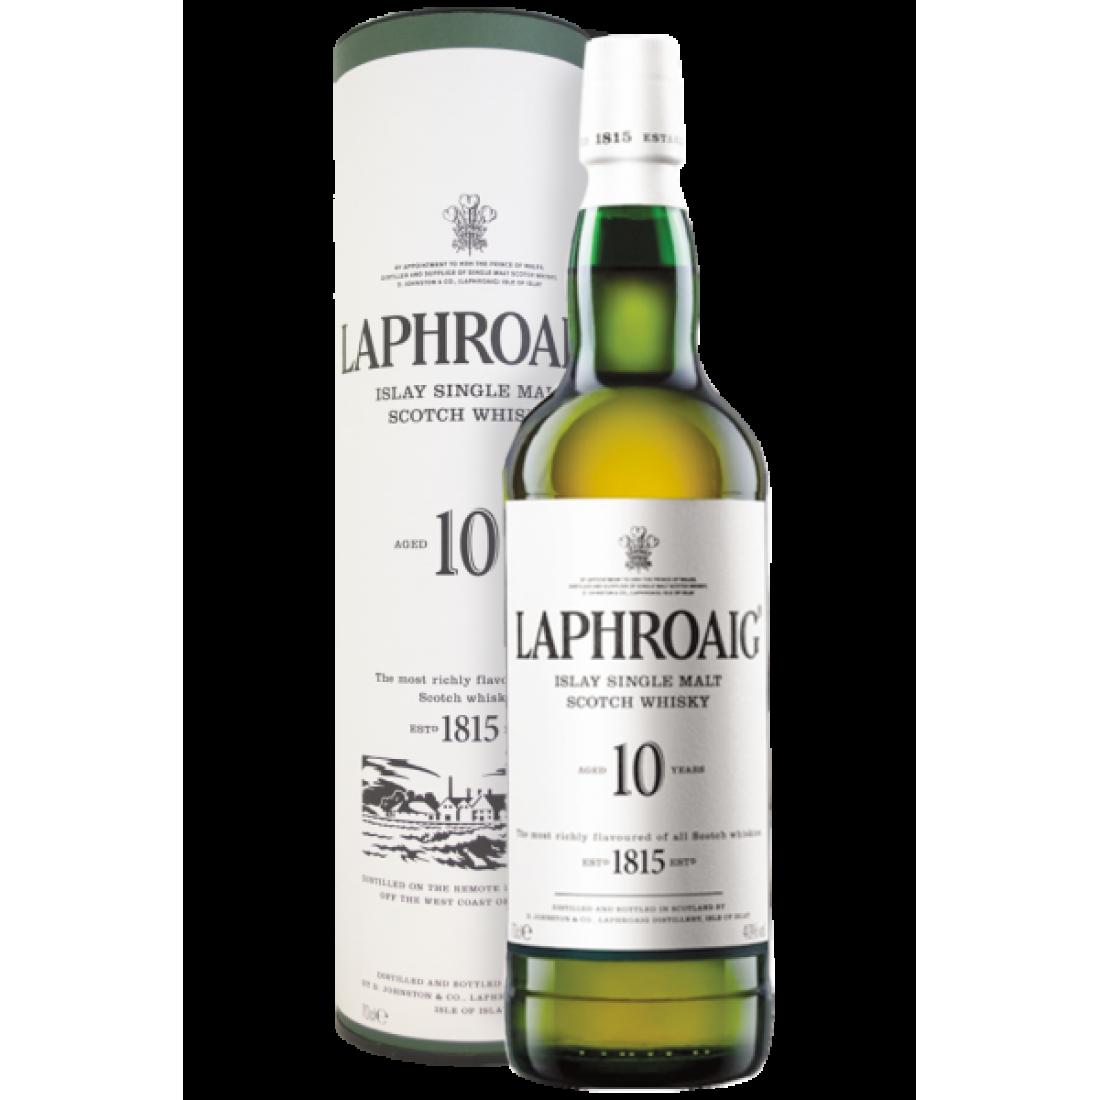 Laphroaig 10 years old (70 cl) - Astucciato